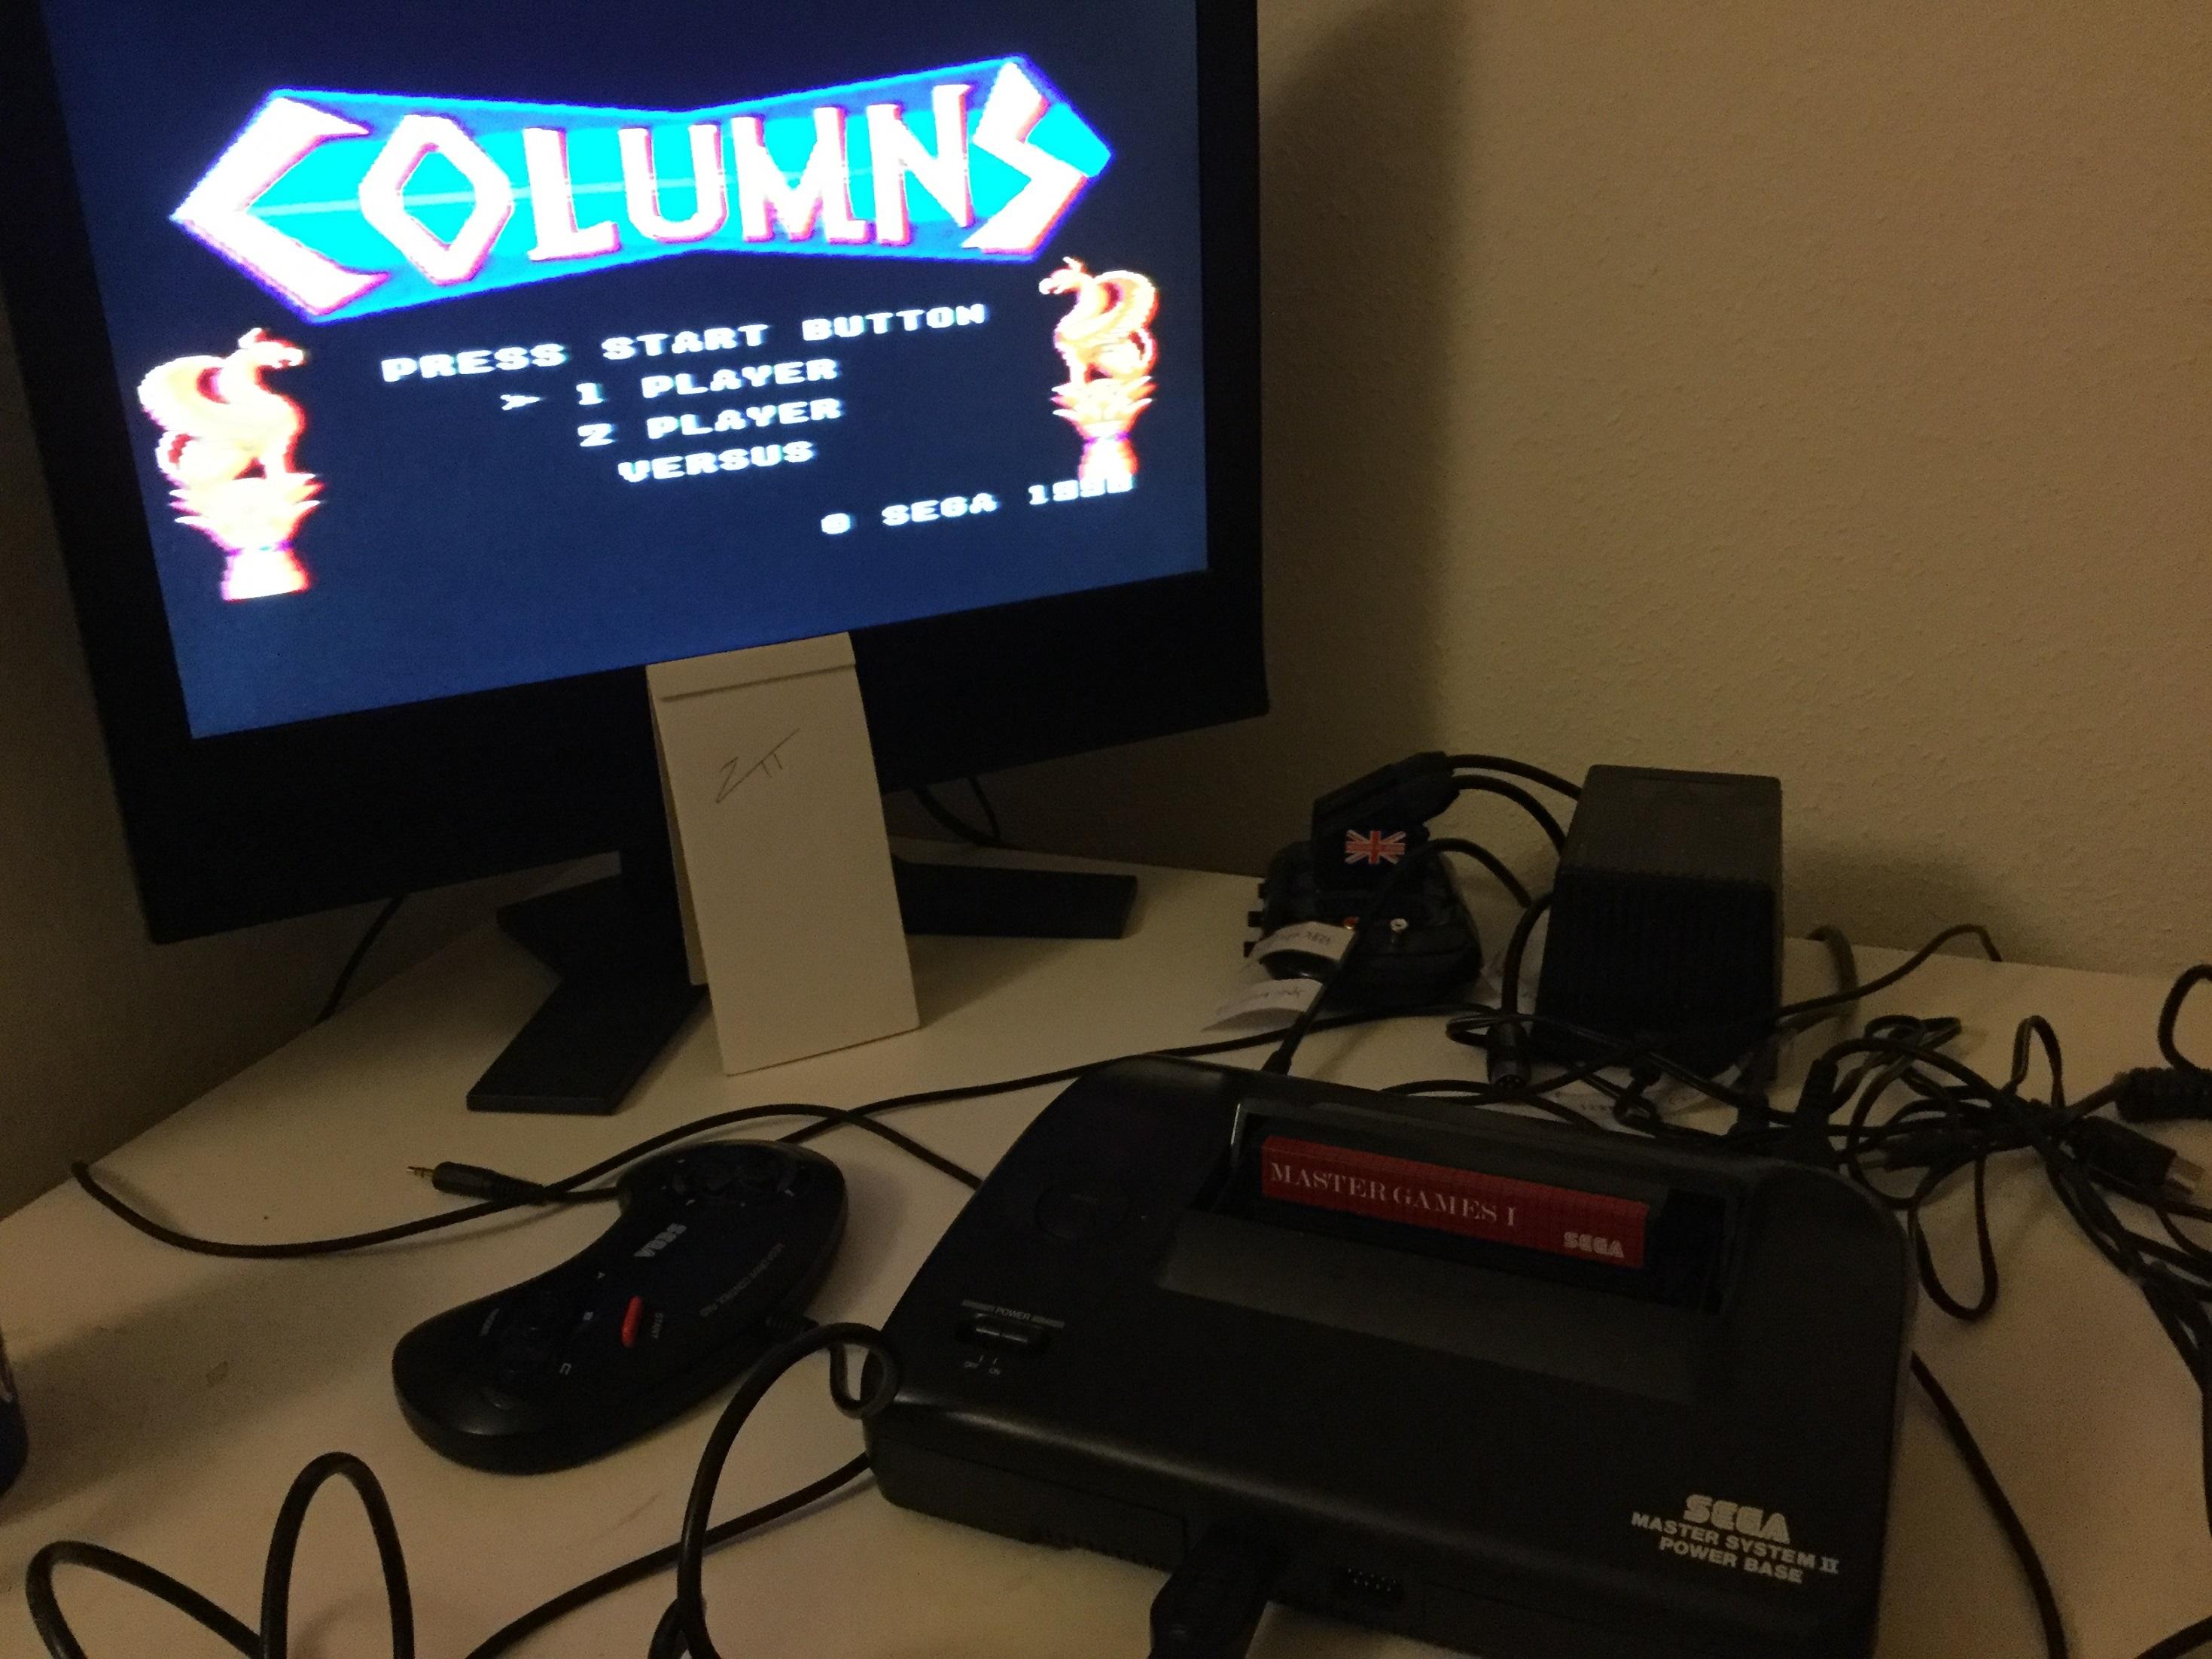 Frankie: Columns [Original/Easy] (Sega Master System) 49,200 points on 2020-12-26 11:08:48